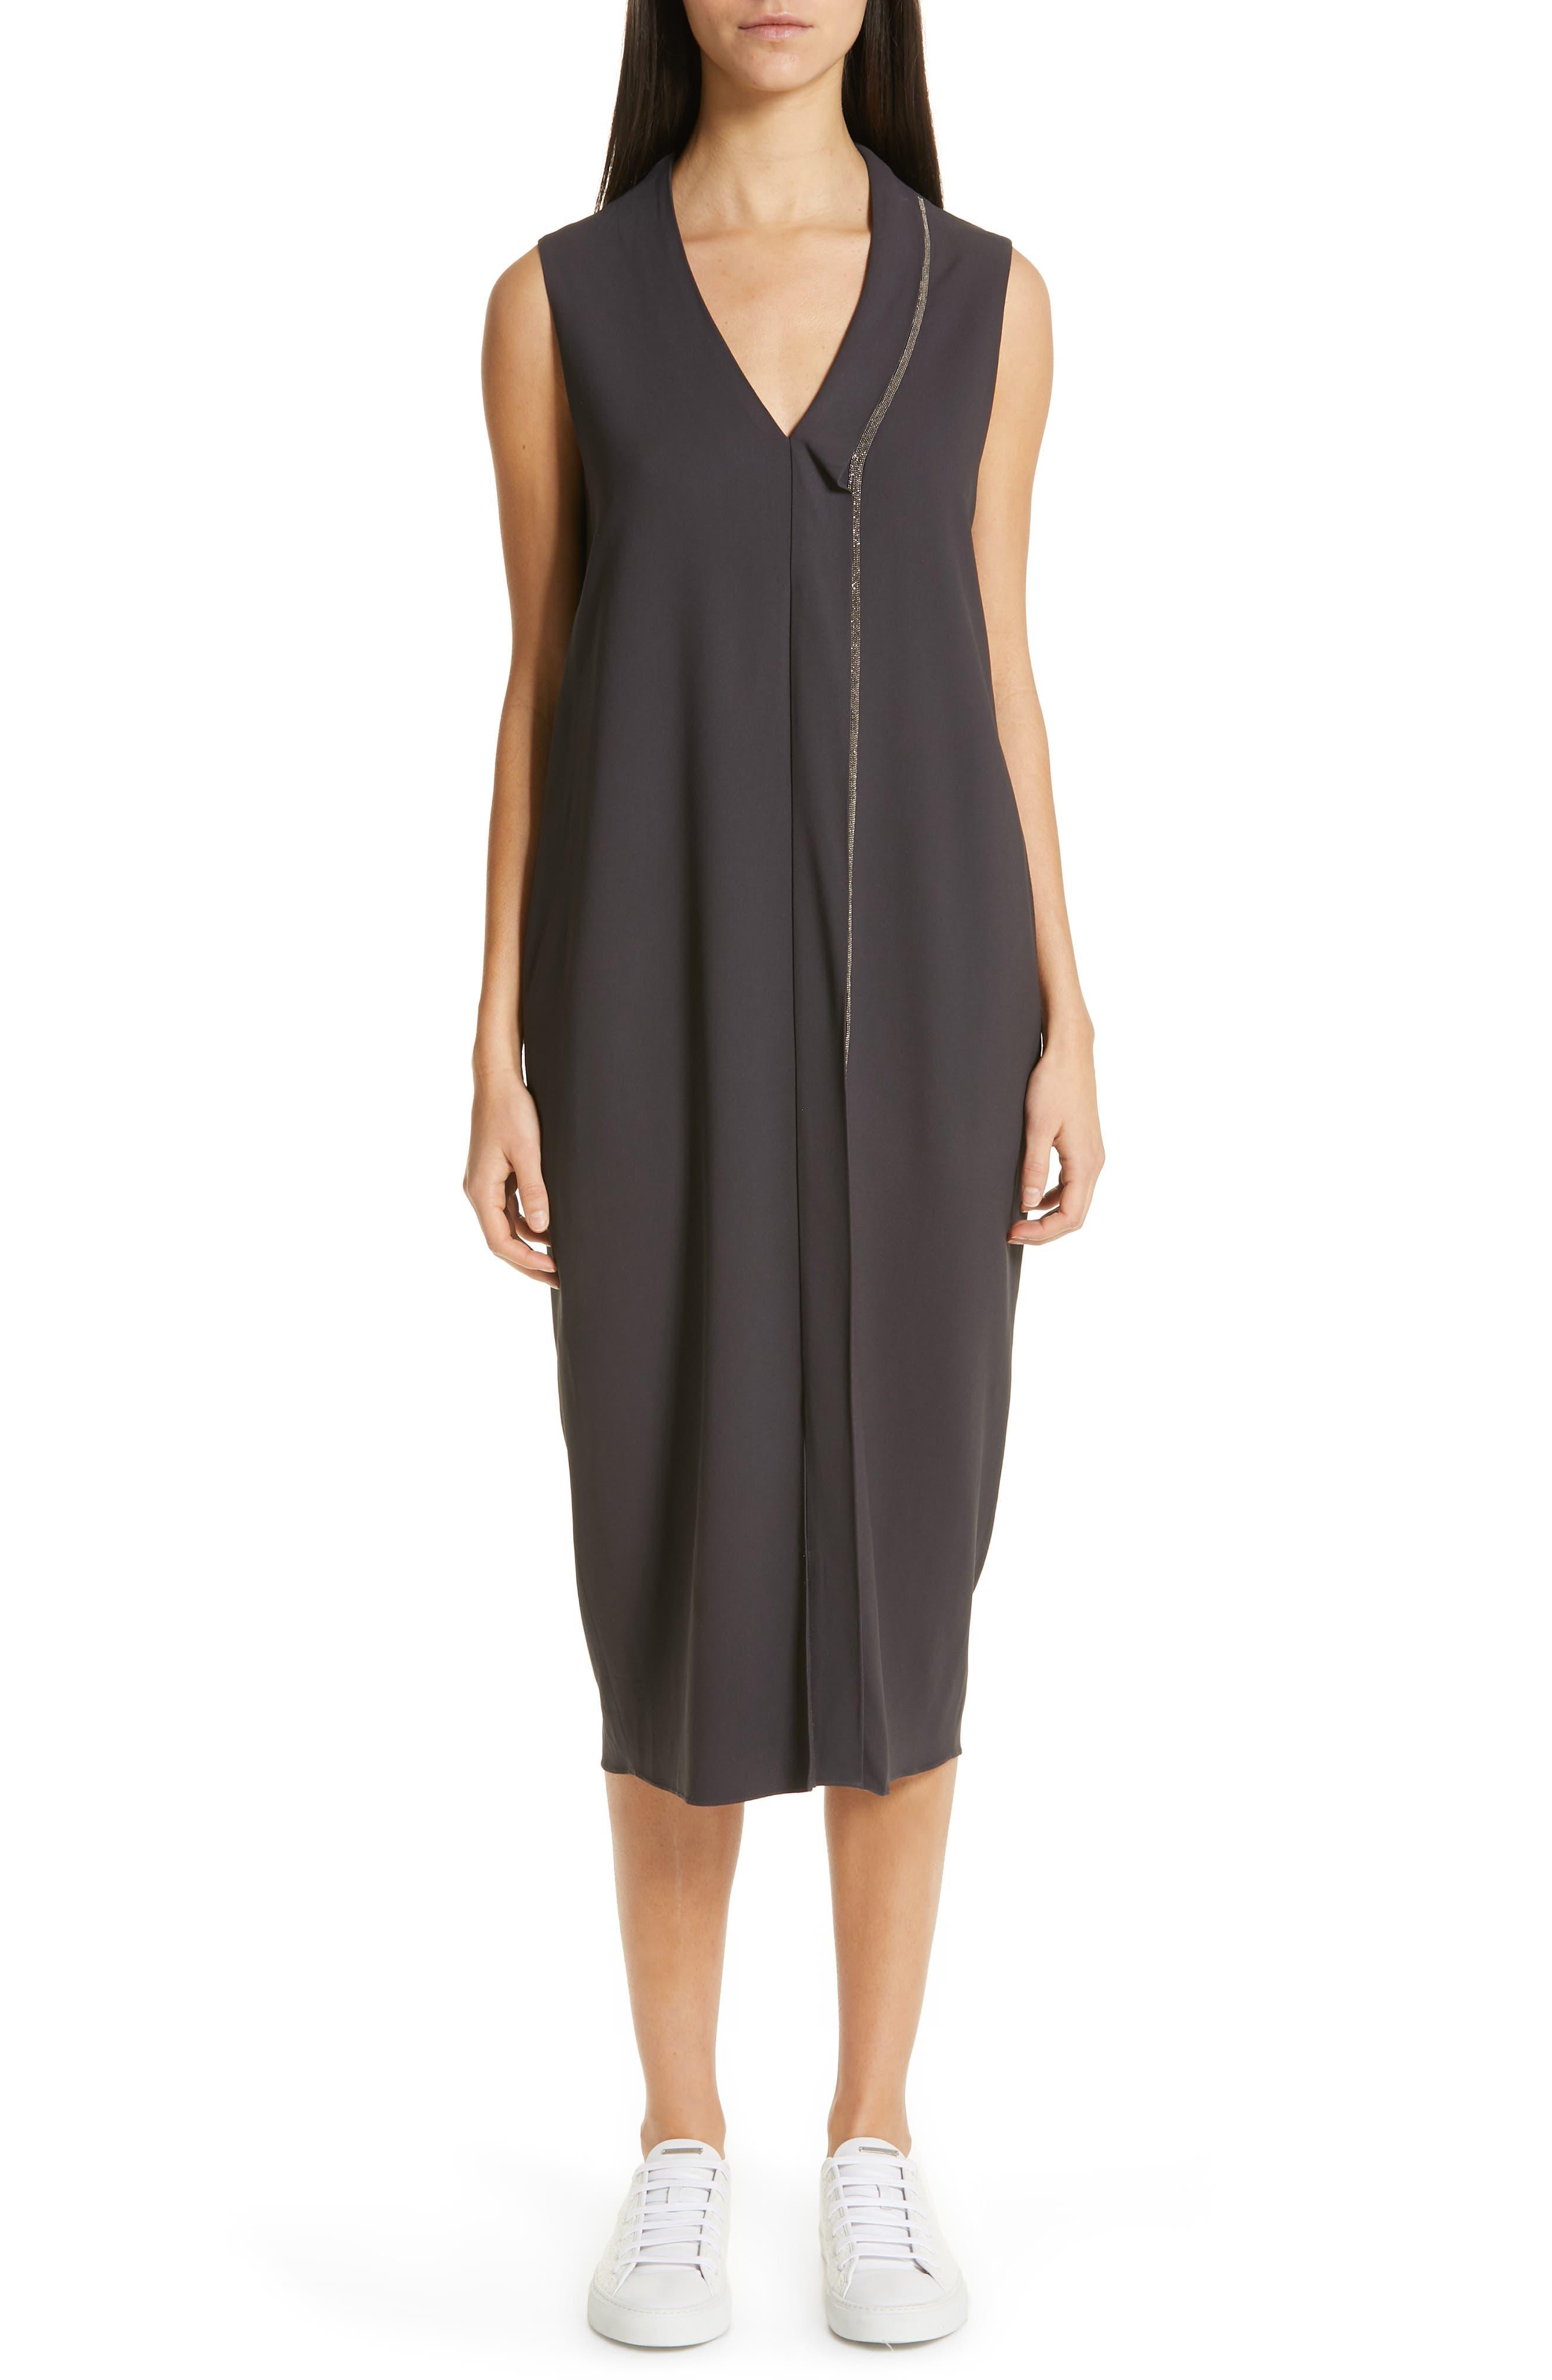 Fabiana Filippi Crepe Dress, 50 IT - Grey